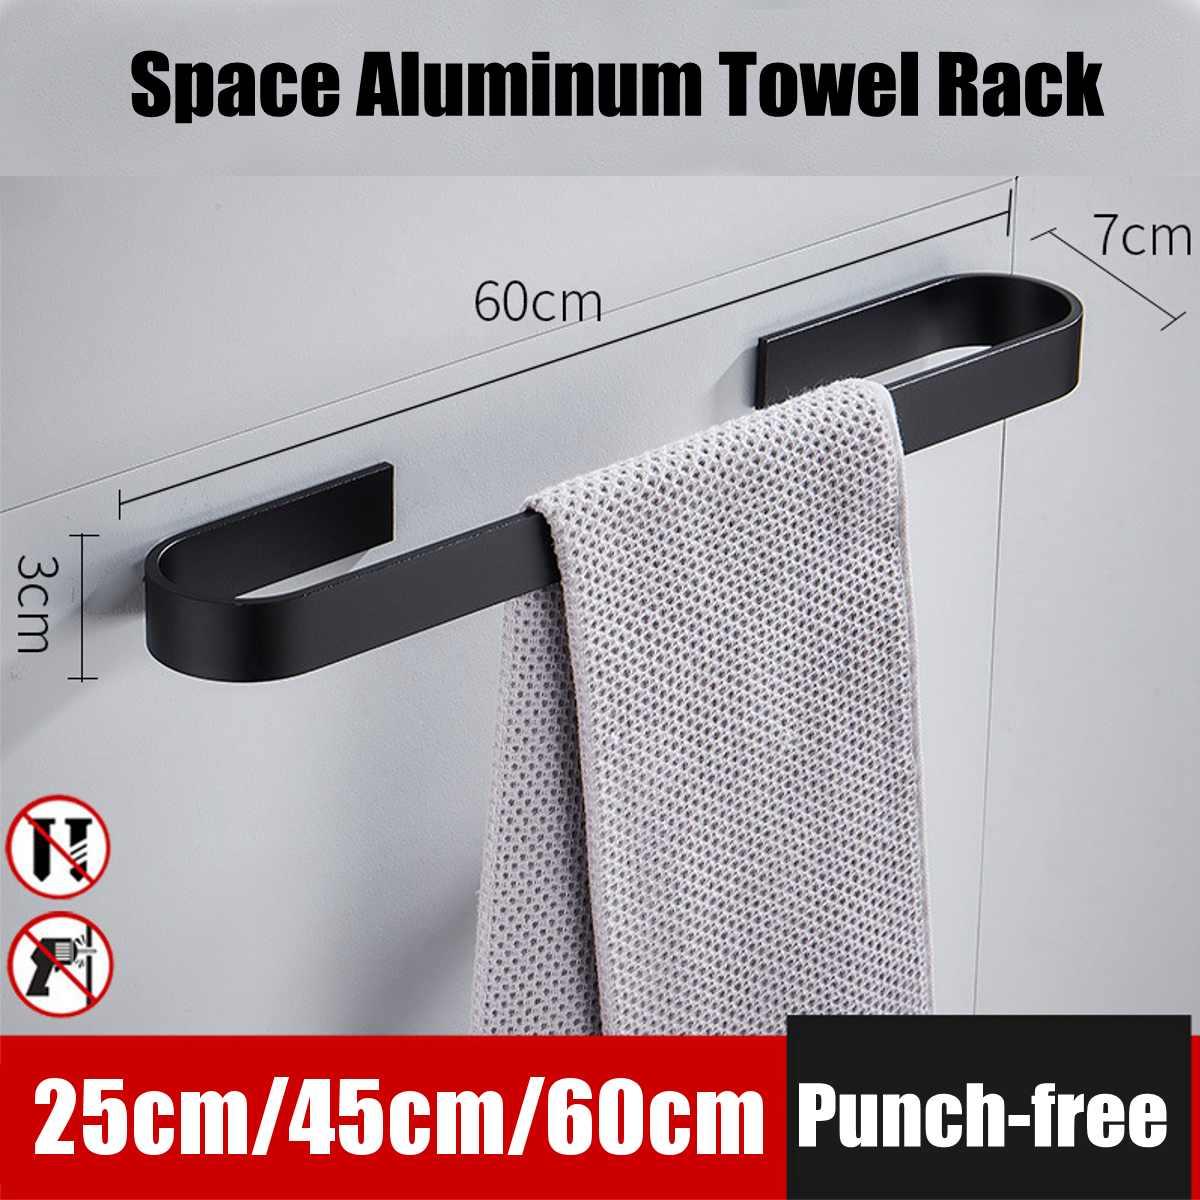 25/45/60cm Towel Bar Black Space Aluminum Wall Mounted Single Washroom Towel Rack Hanging Holder Accessories